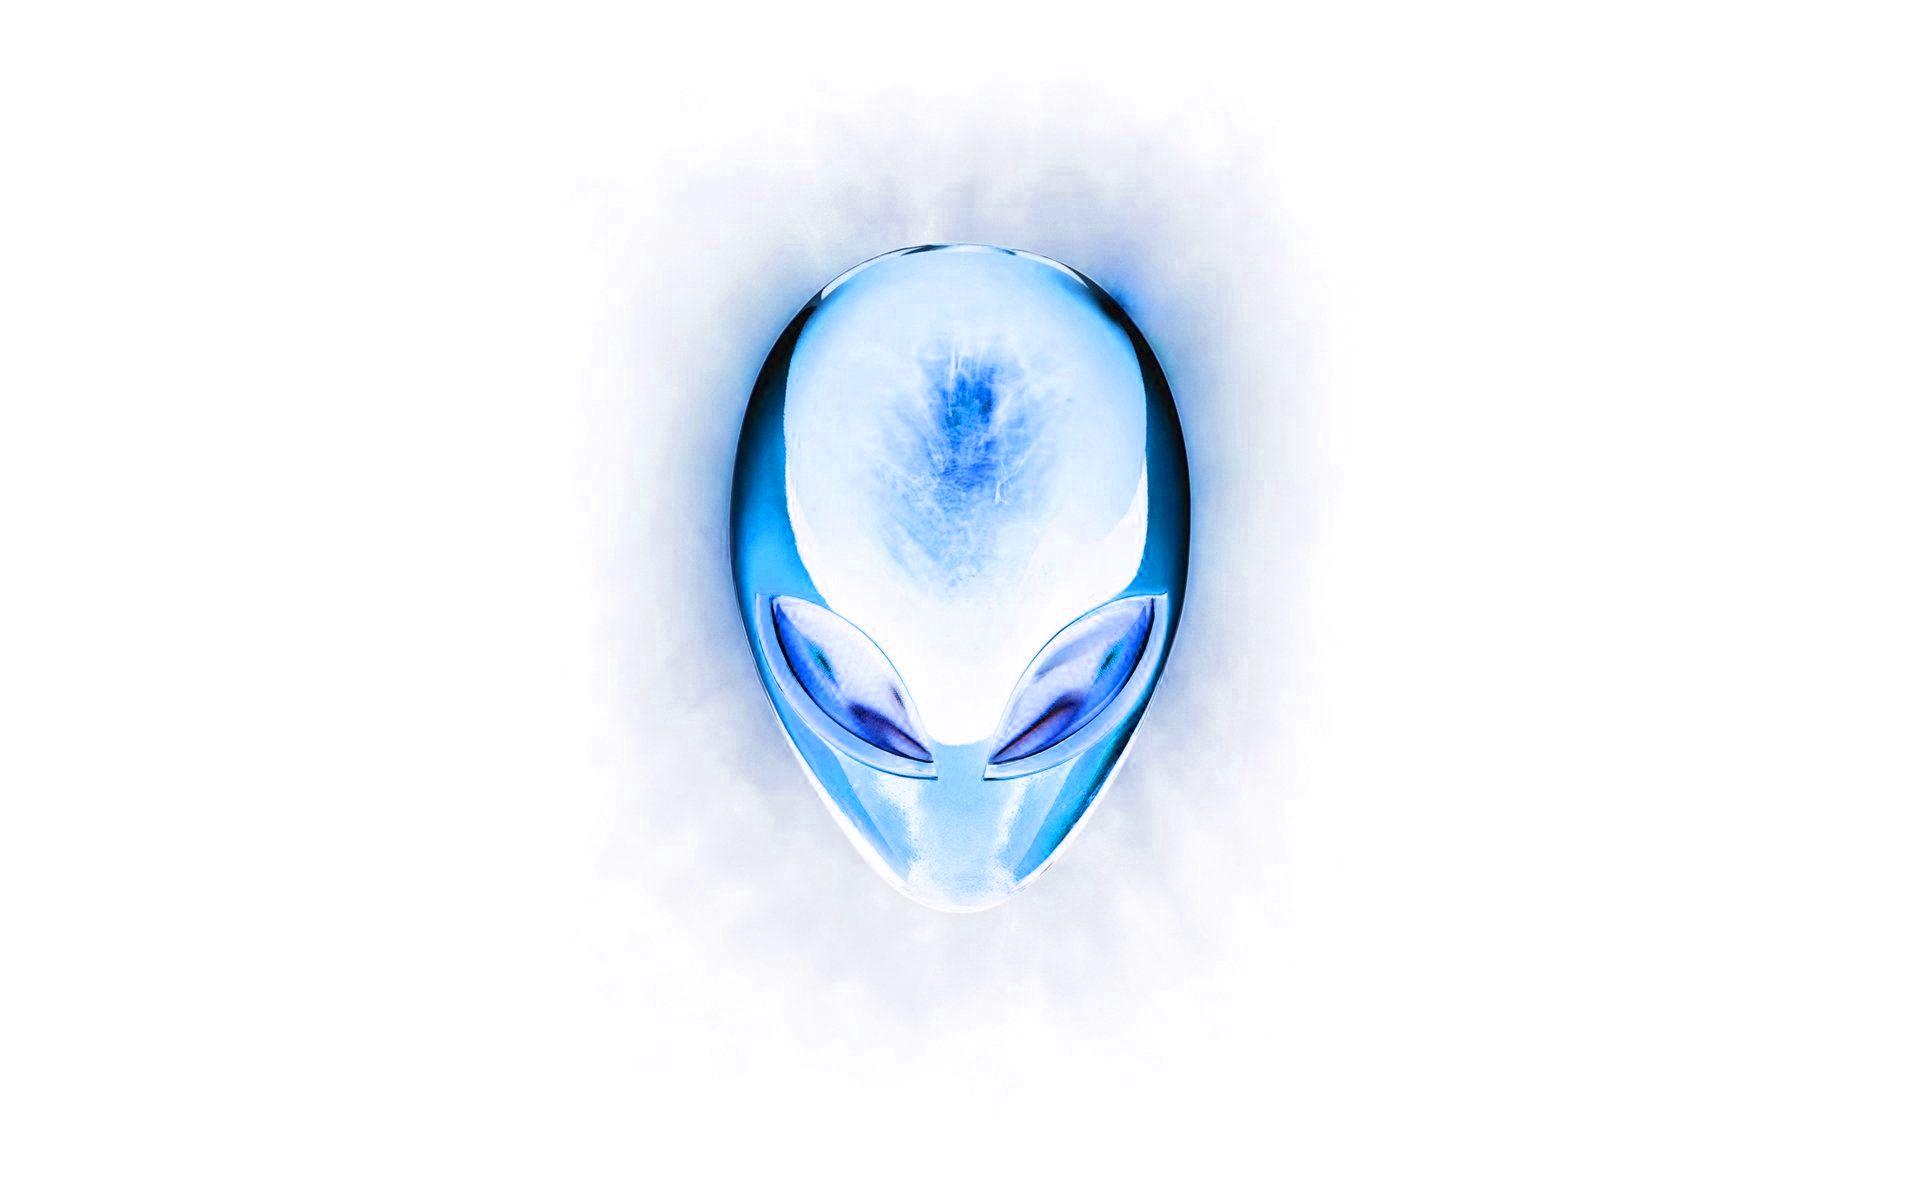 Alienware Desktop Background White And Blue Alien Head 19x10 Alienware Backgrounds Desktop Alienware Desktop